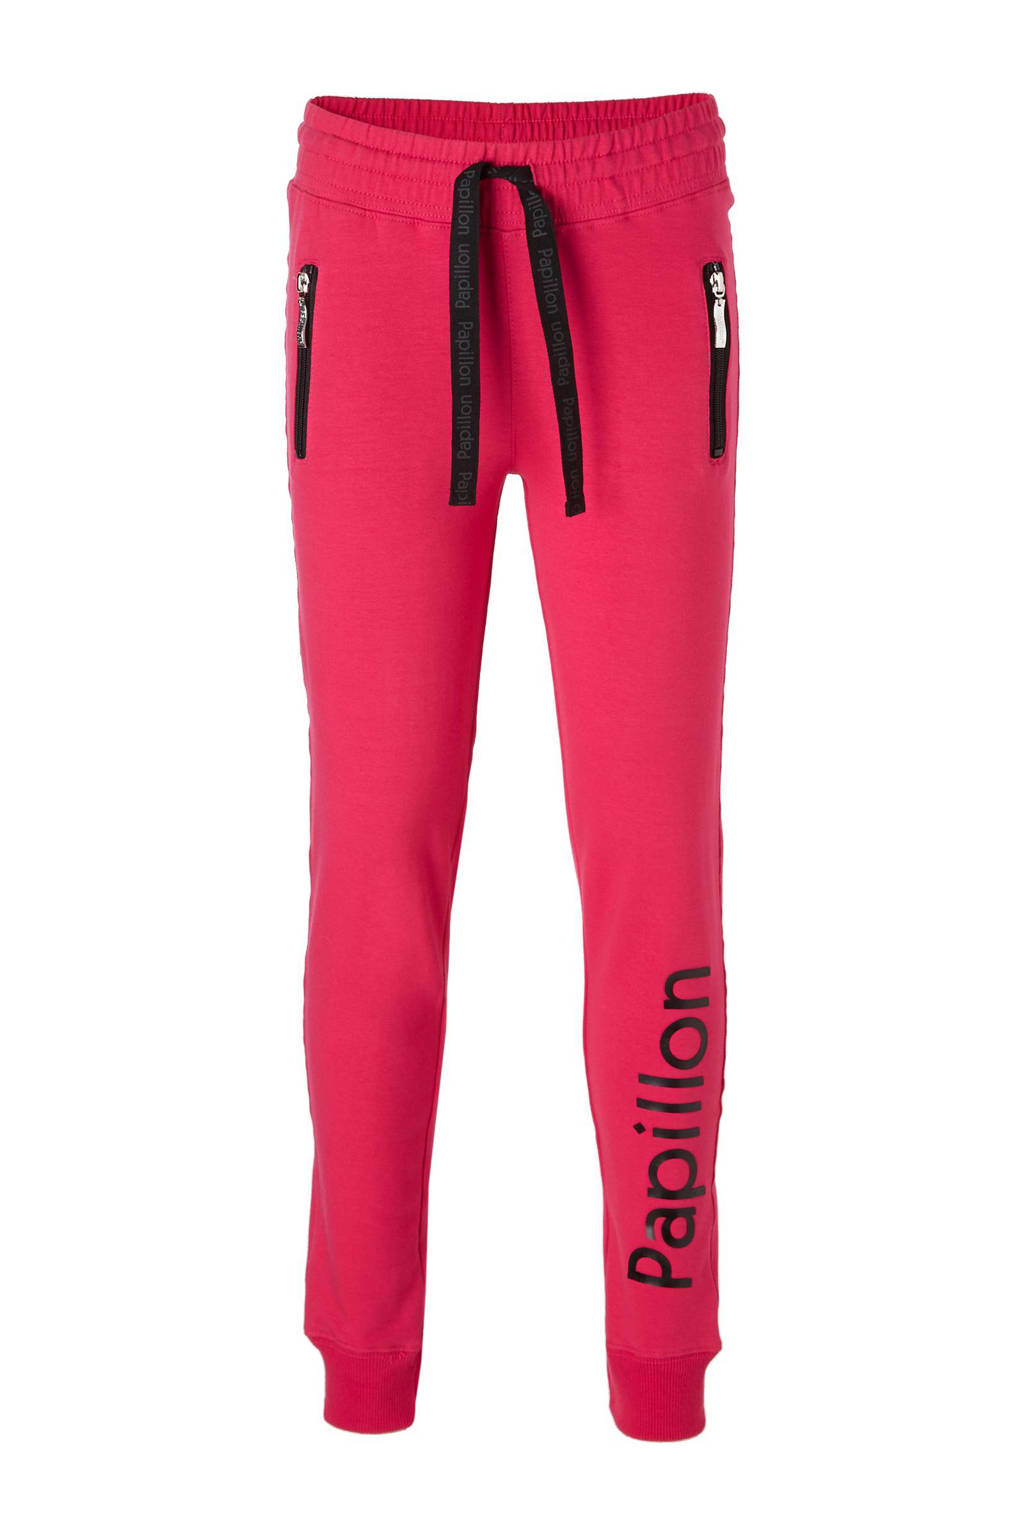 Papillon sportbroek, roze/ zwart